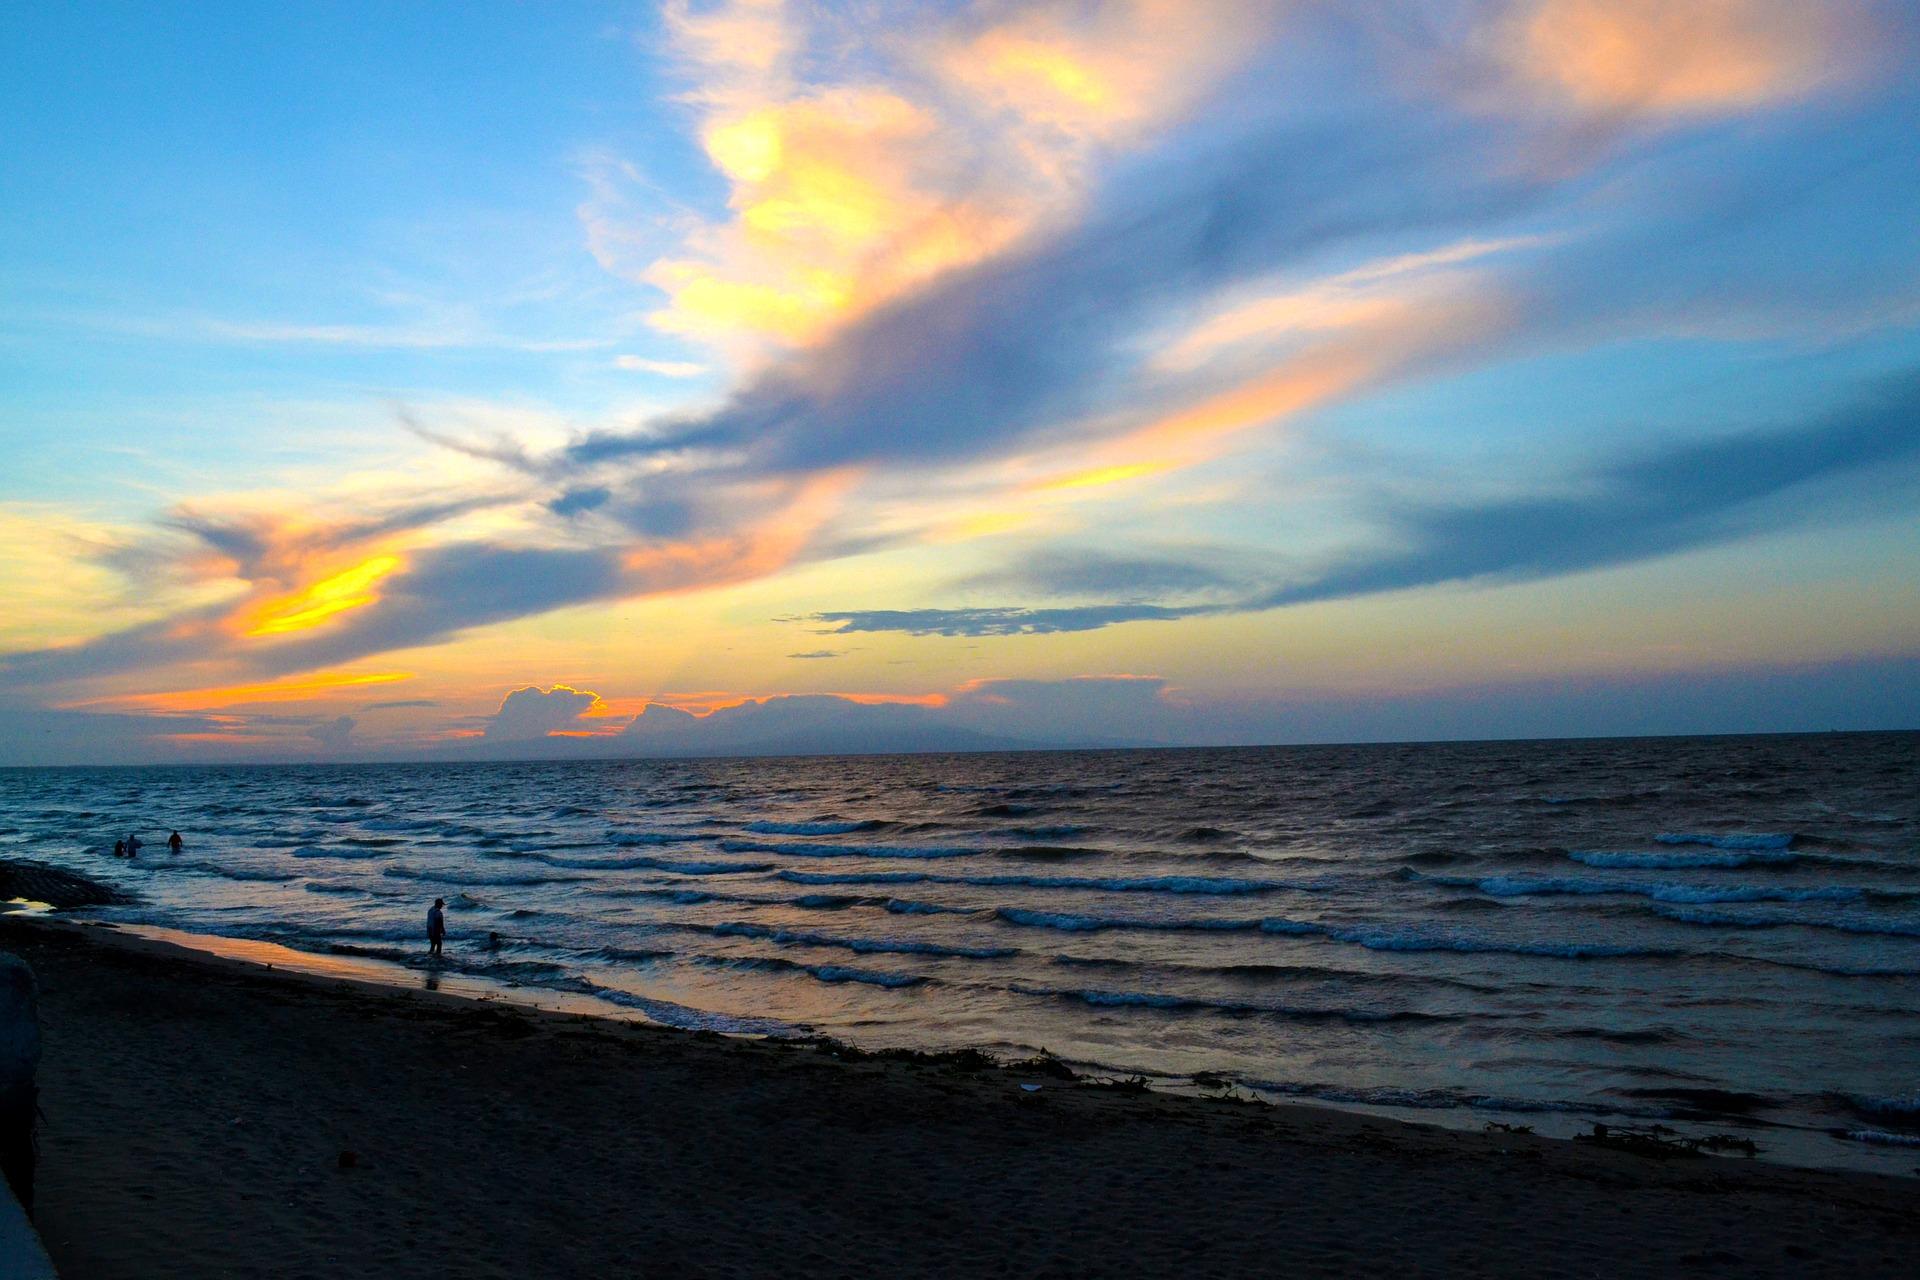 Karibikküste - Meer bei Sonnenuntergang